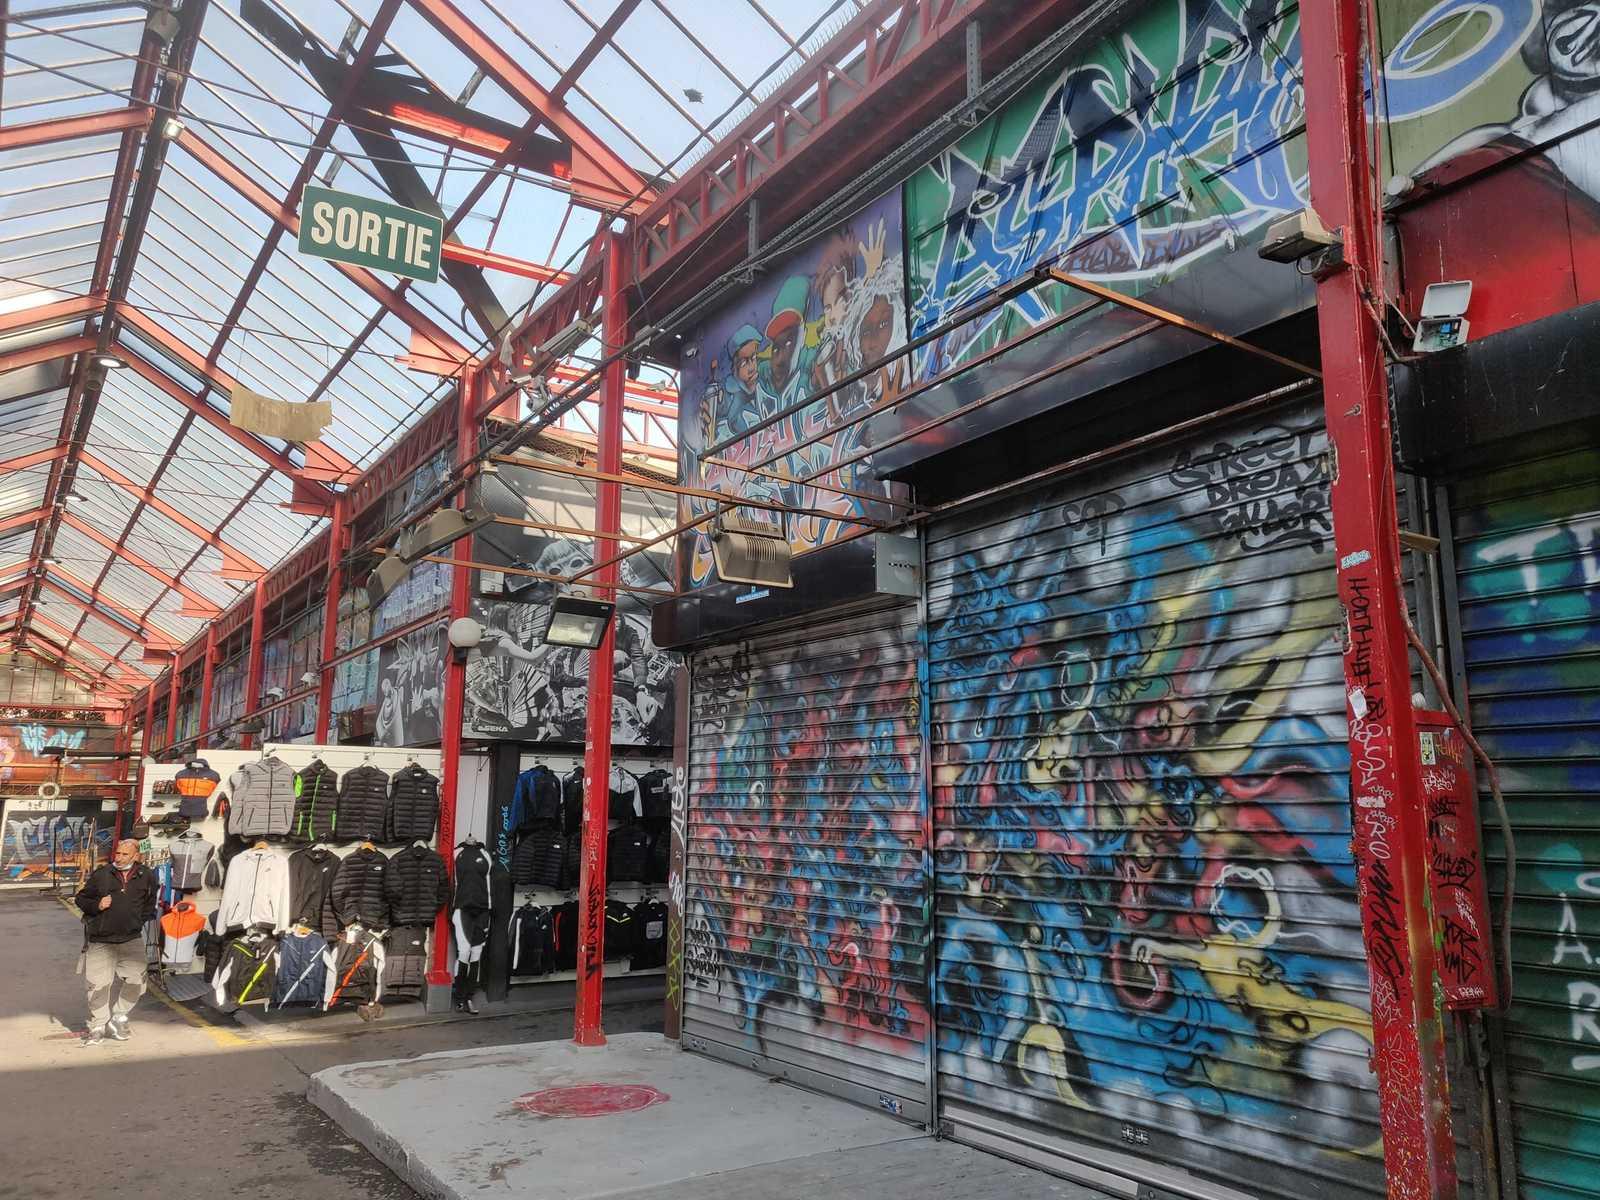 STESI Graffiti Paris Marché Malik Saint Ouen 93 Banlieue Vorort, Paris, Grand-Paris, Halle, überall Streetart und Wandmalereien